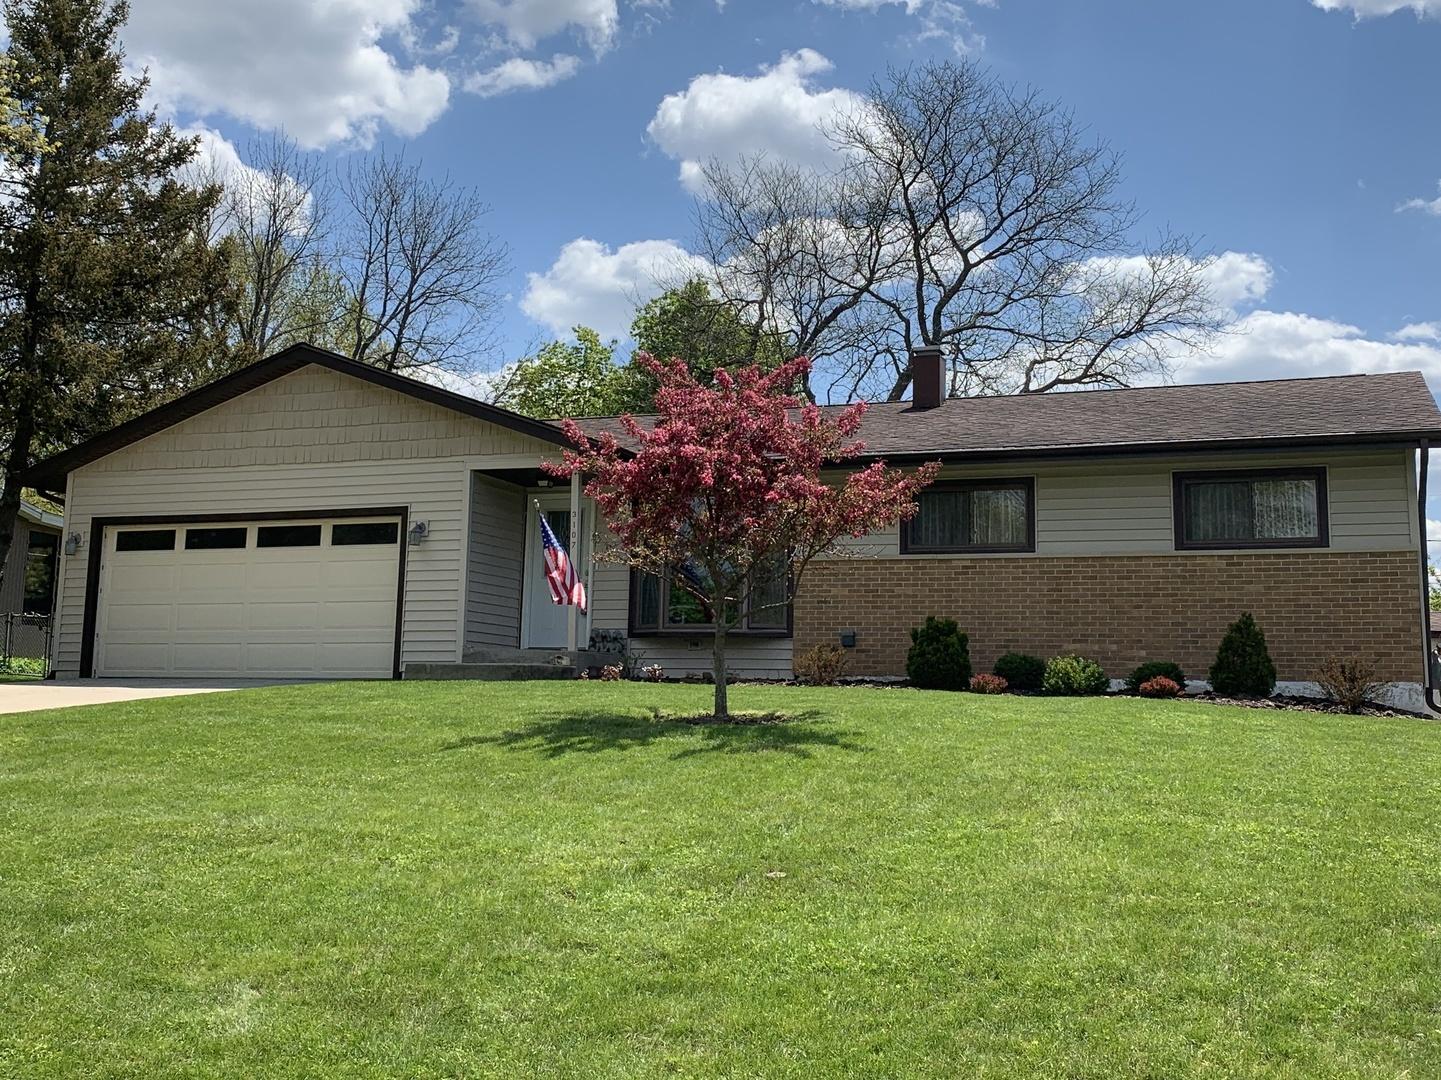 3107 Highland ,Cary, Illinois 60013